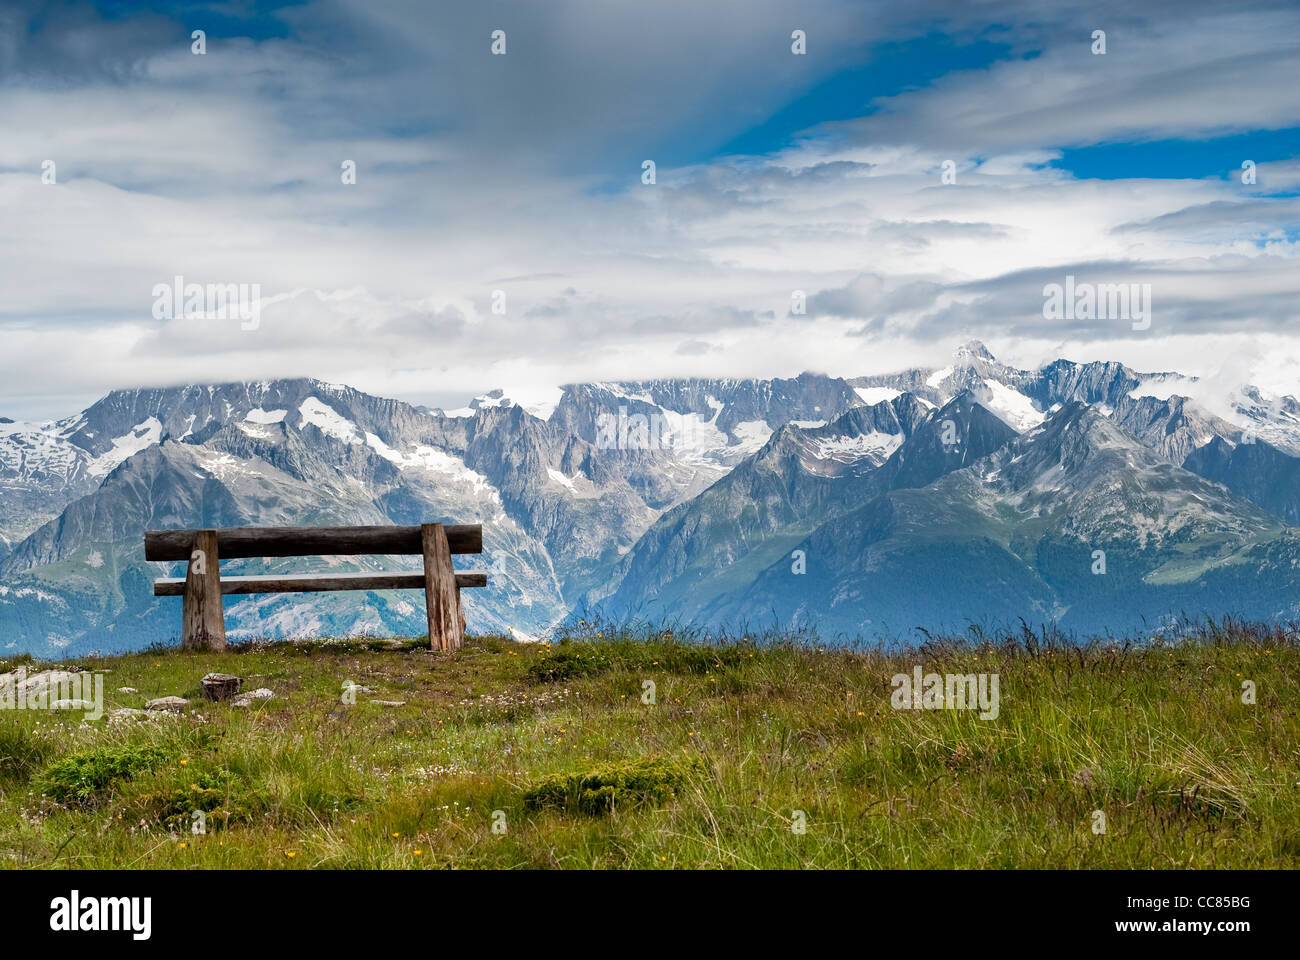 Svuotare una panchina nel parco in alta montagna, vista da Hannigalp, Vallese, Svizzera Immagini Stock